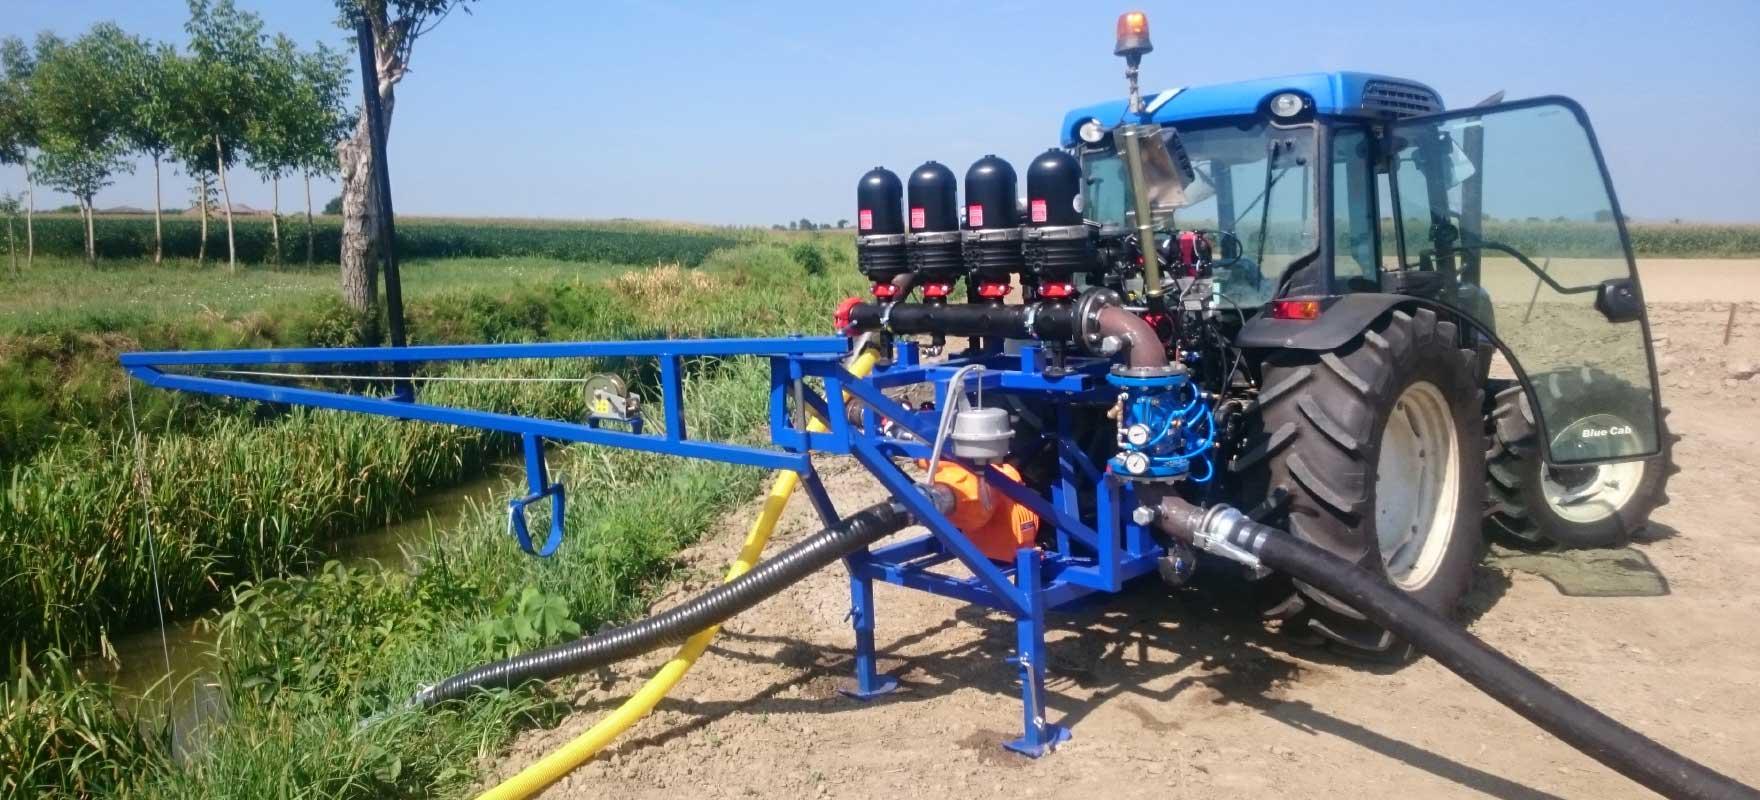 01.10 pompe irrigazione veneta